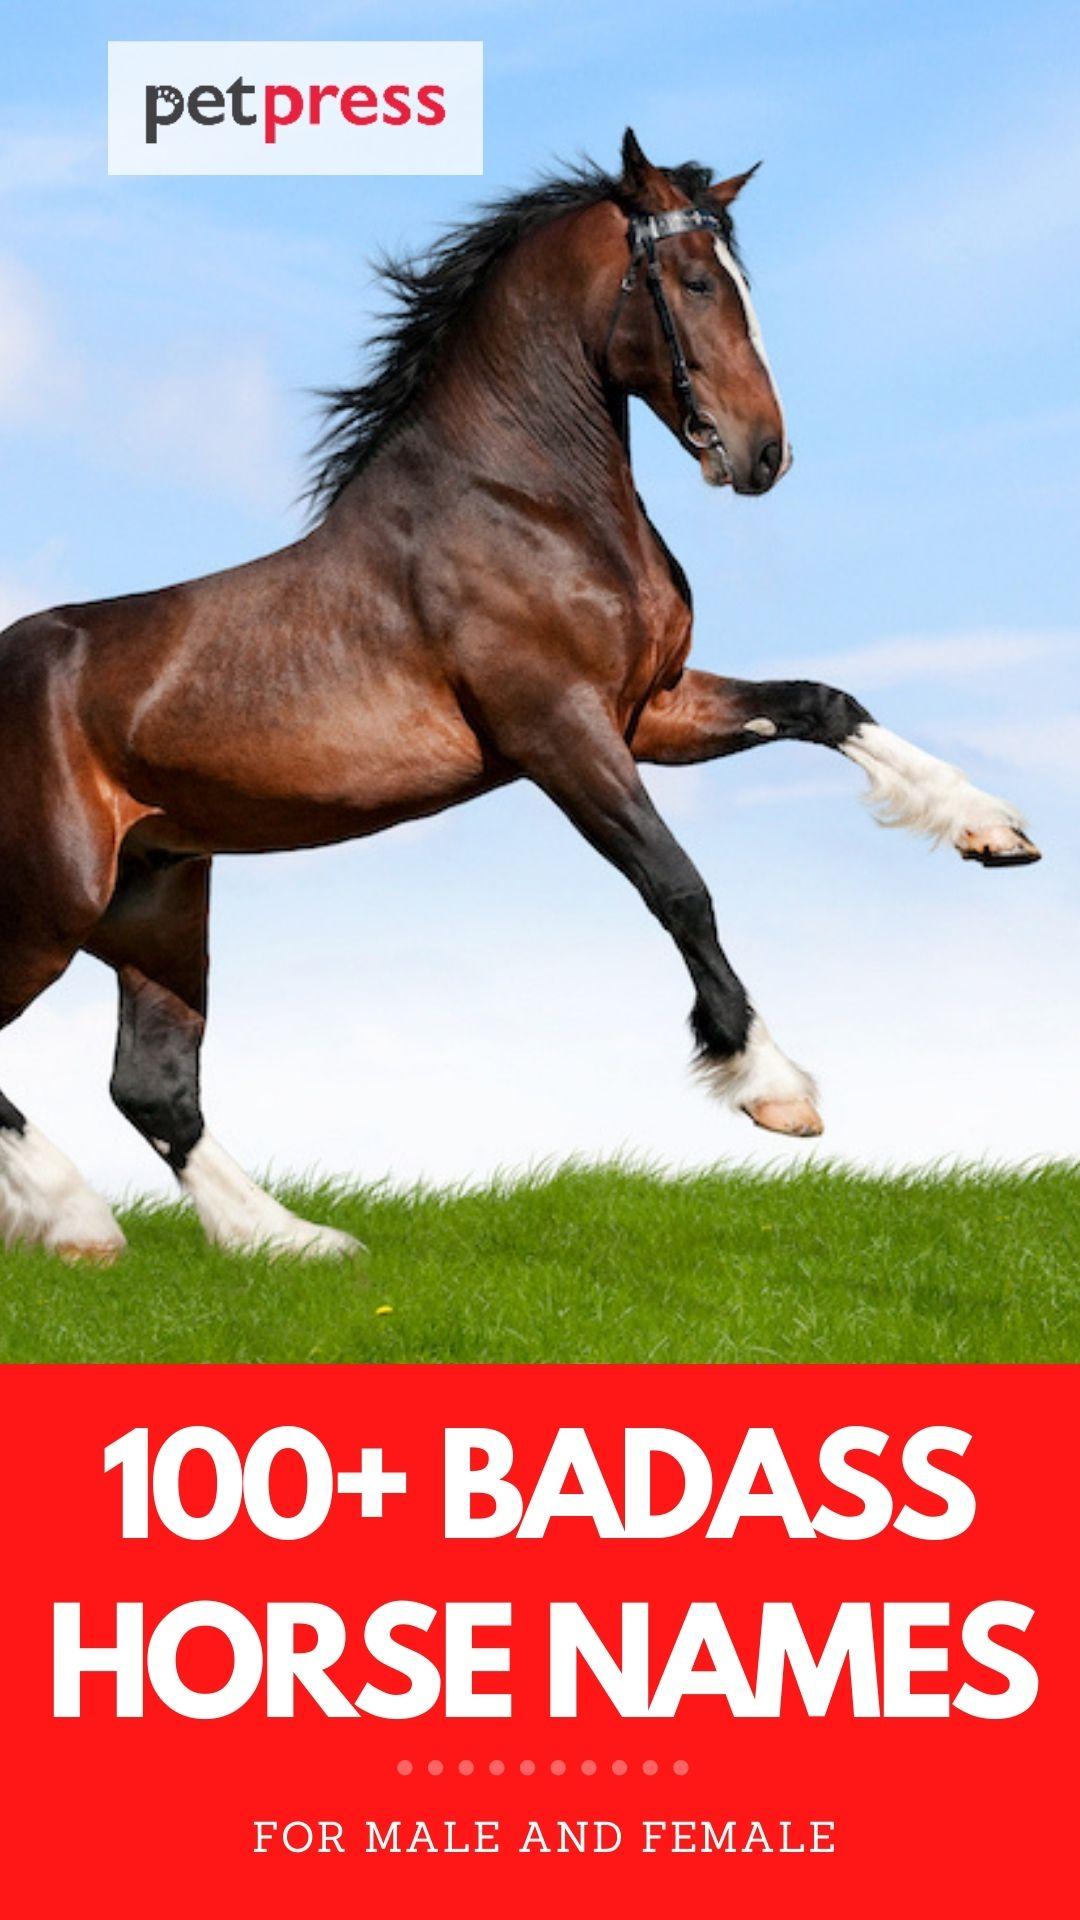 top 100+ badass horse names